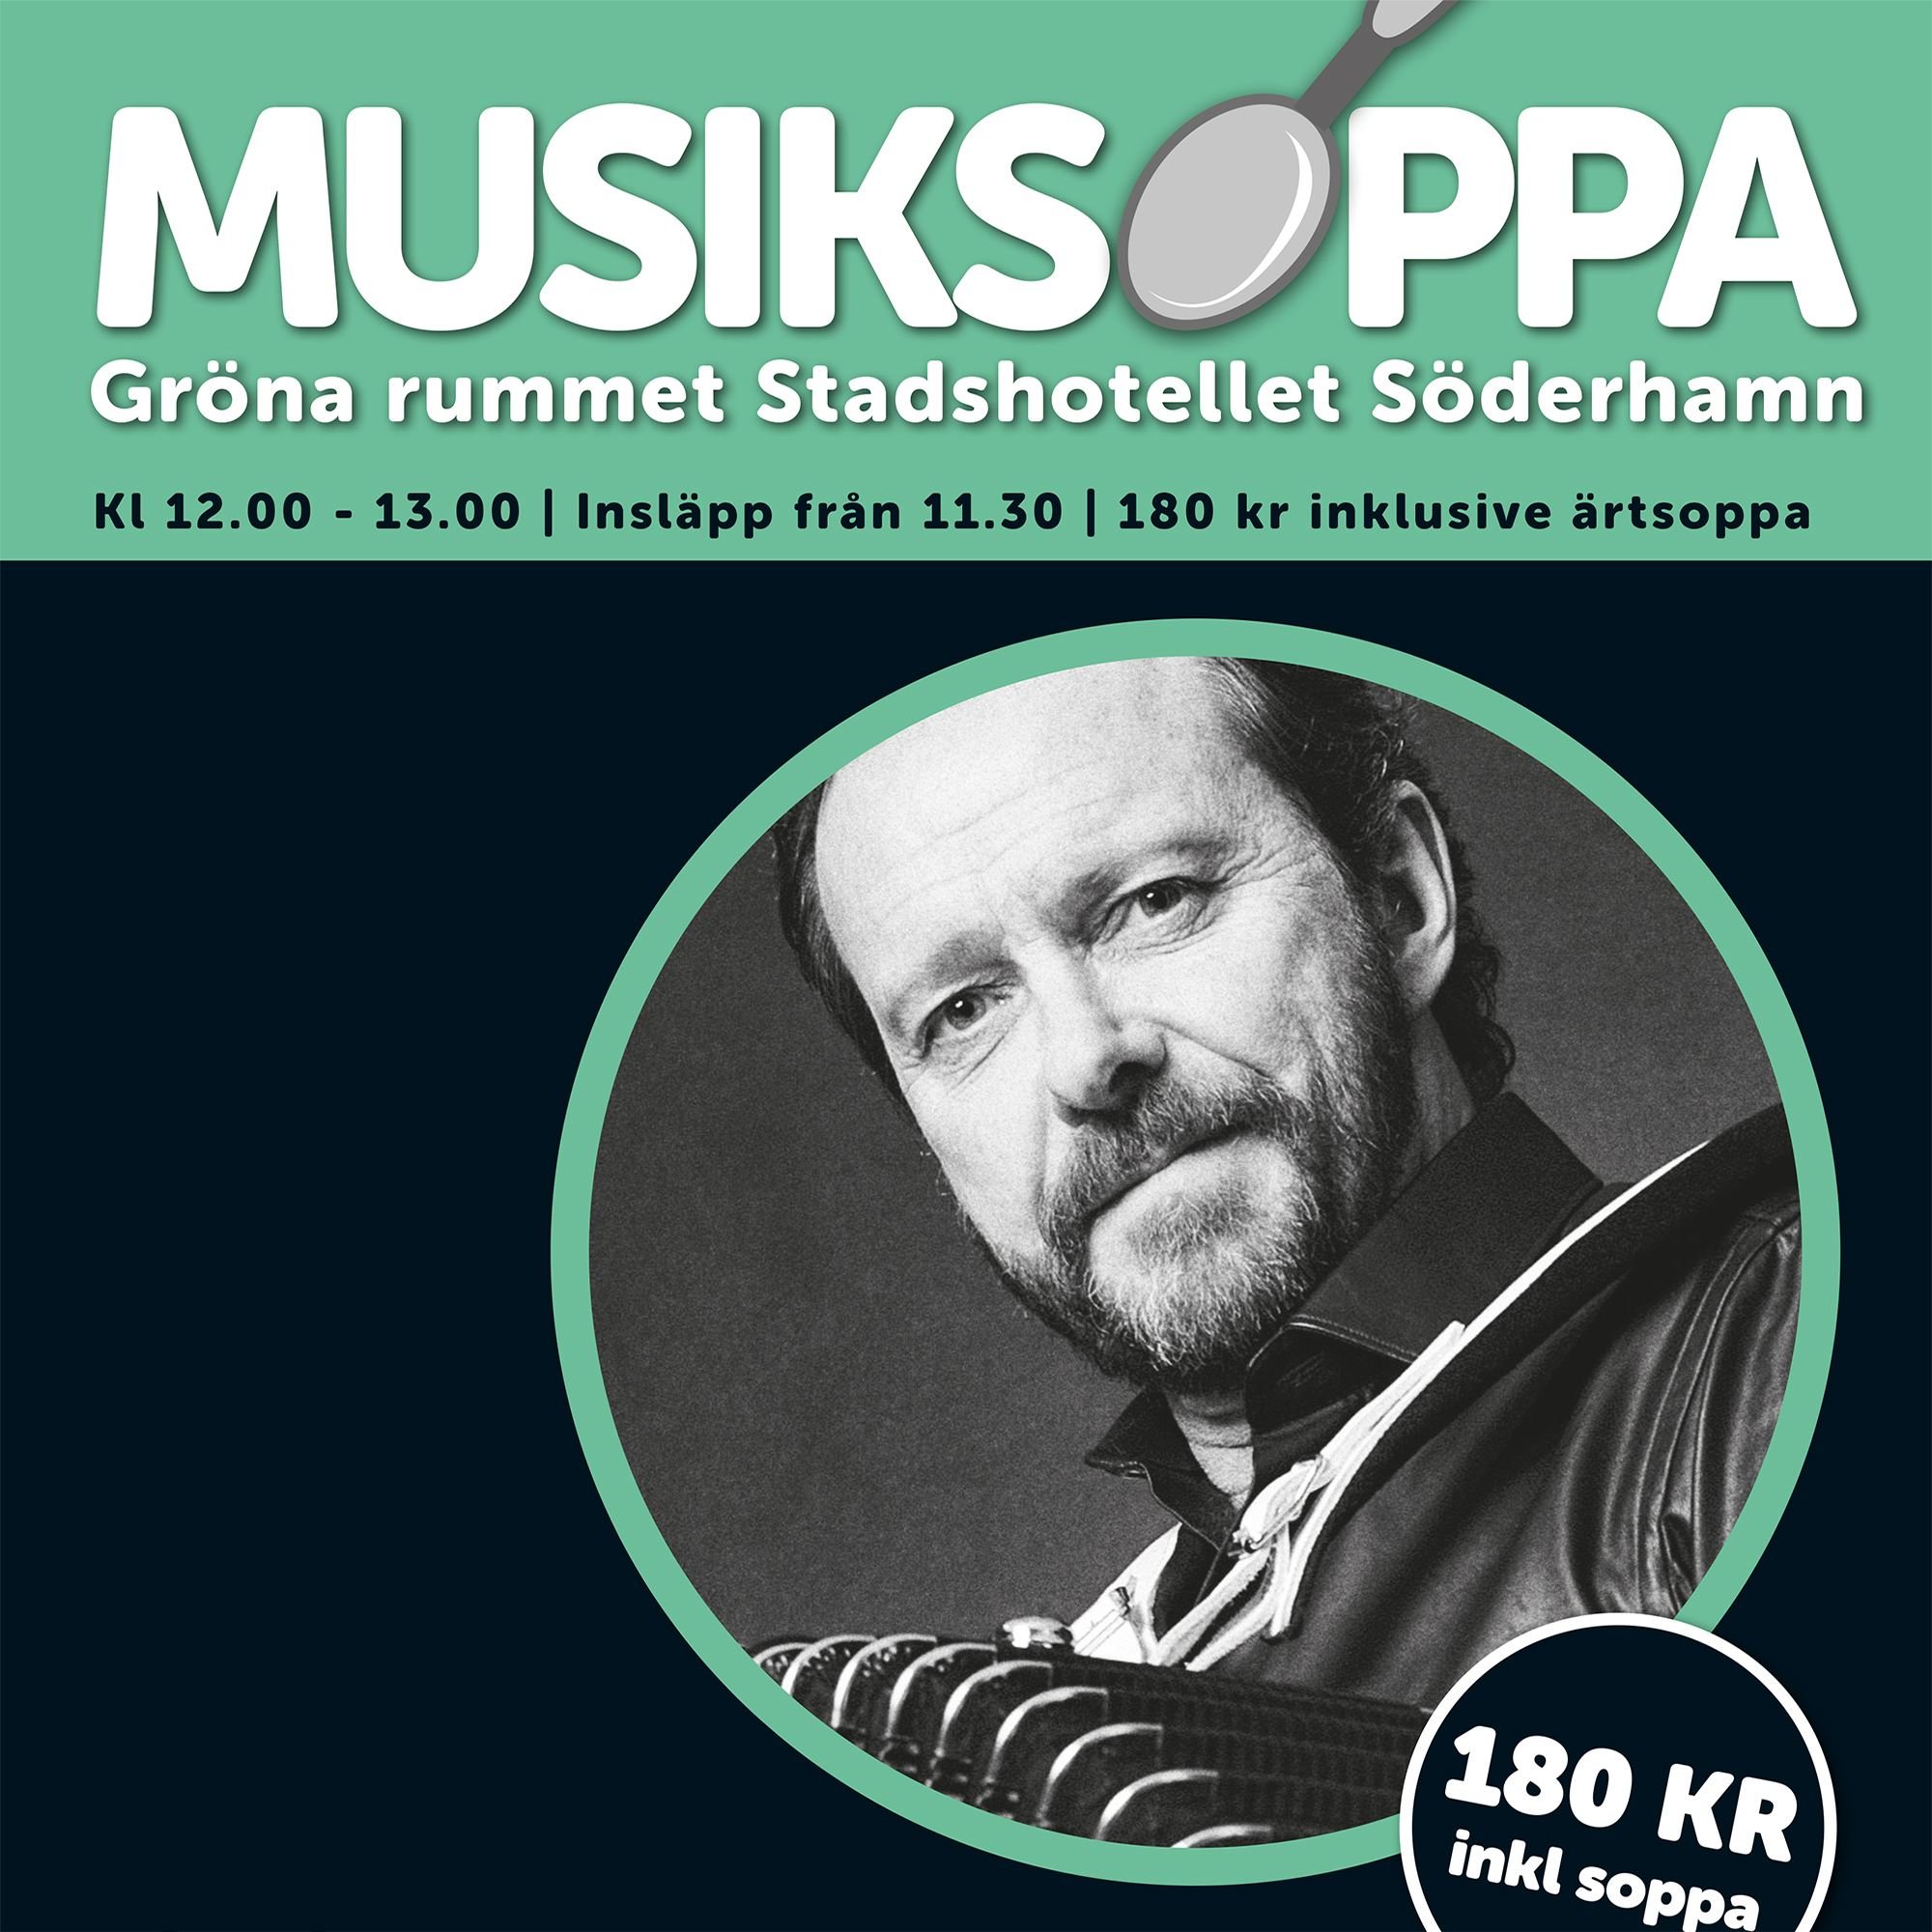 Musiksoppa med Bengan Jansson